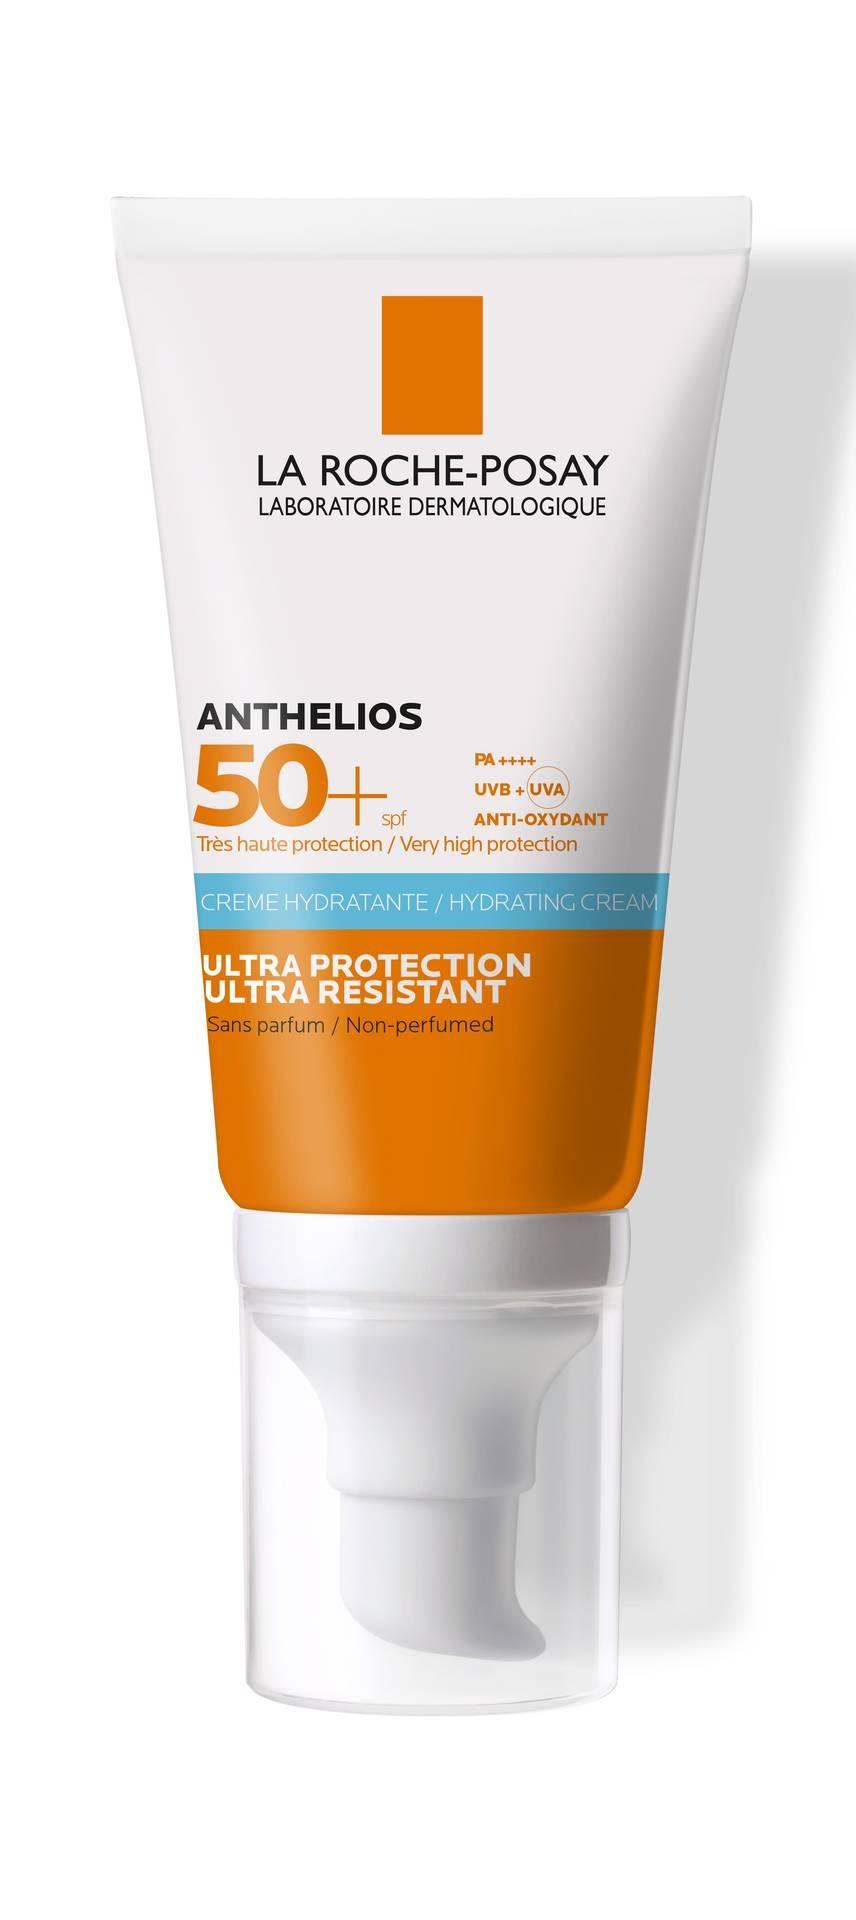 lrp-anthelios-cream-SP-SPF50-50ml-tube-shadow